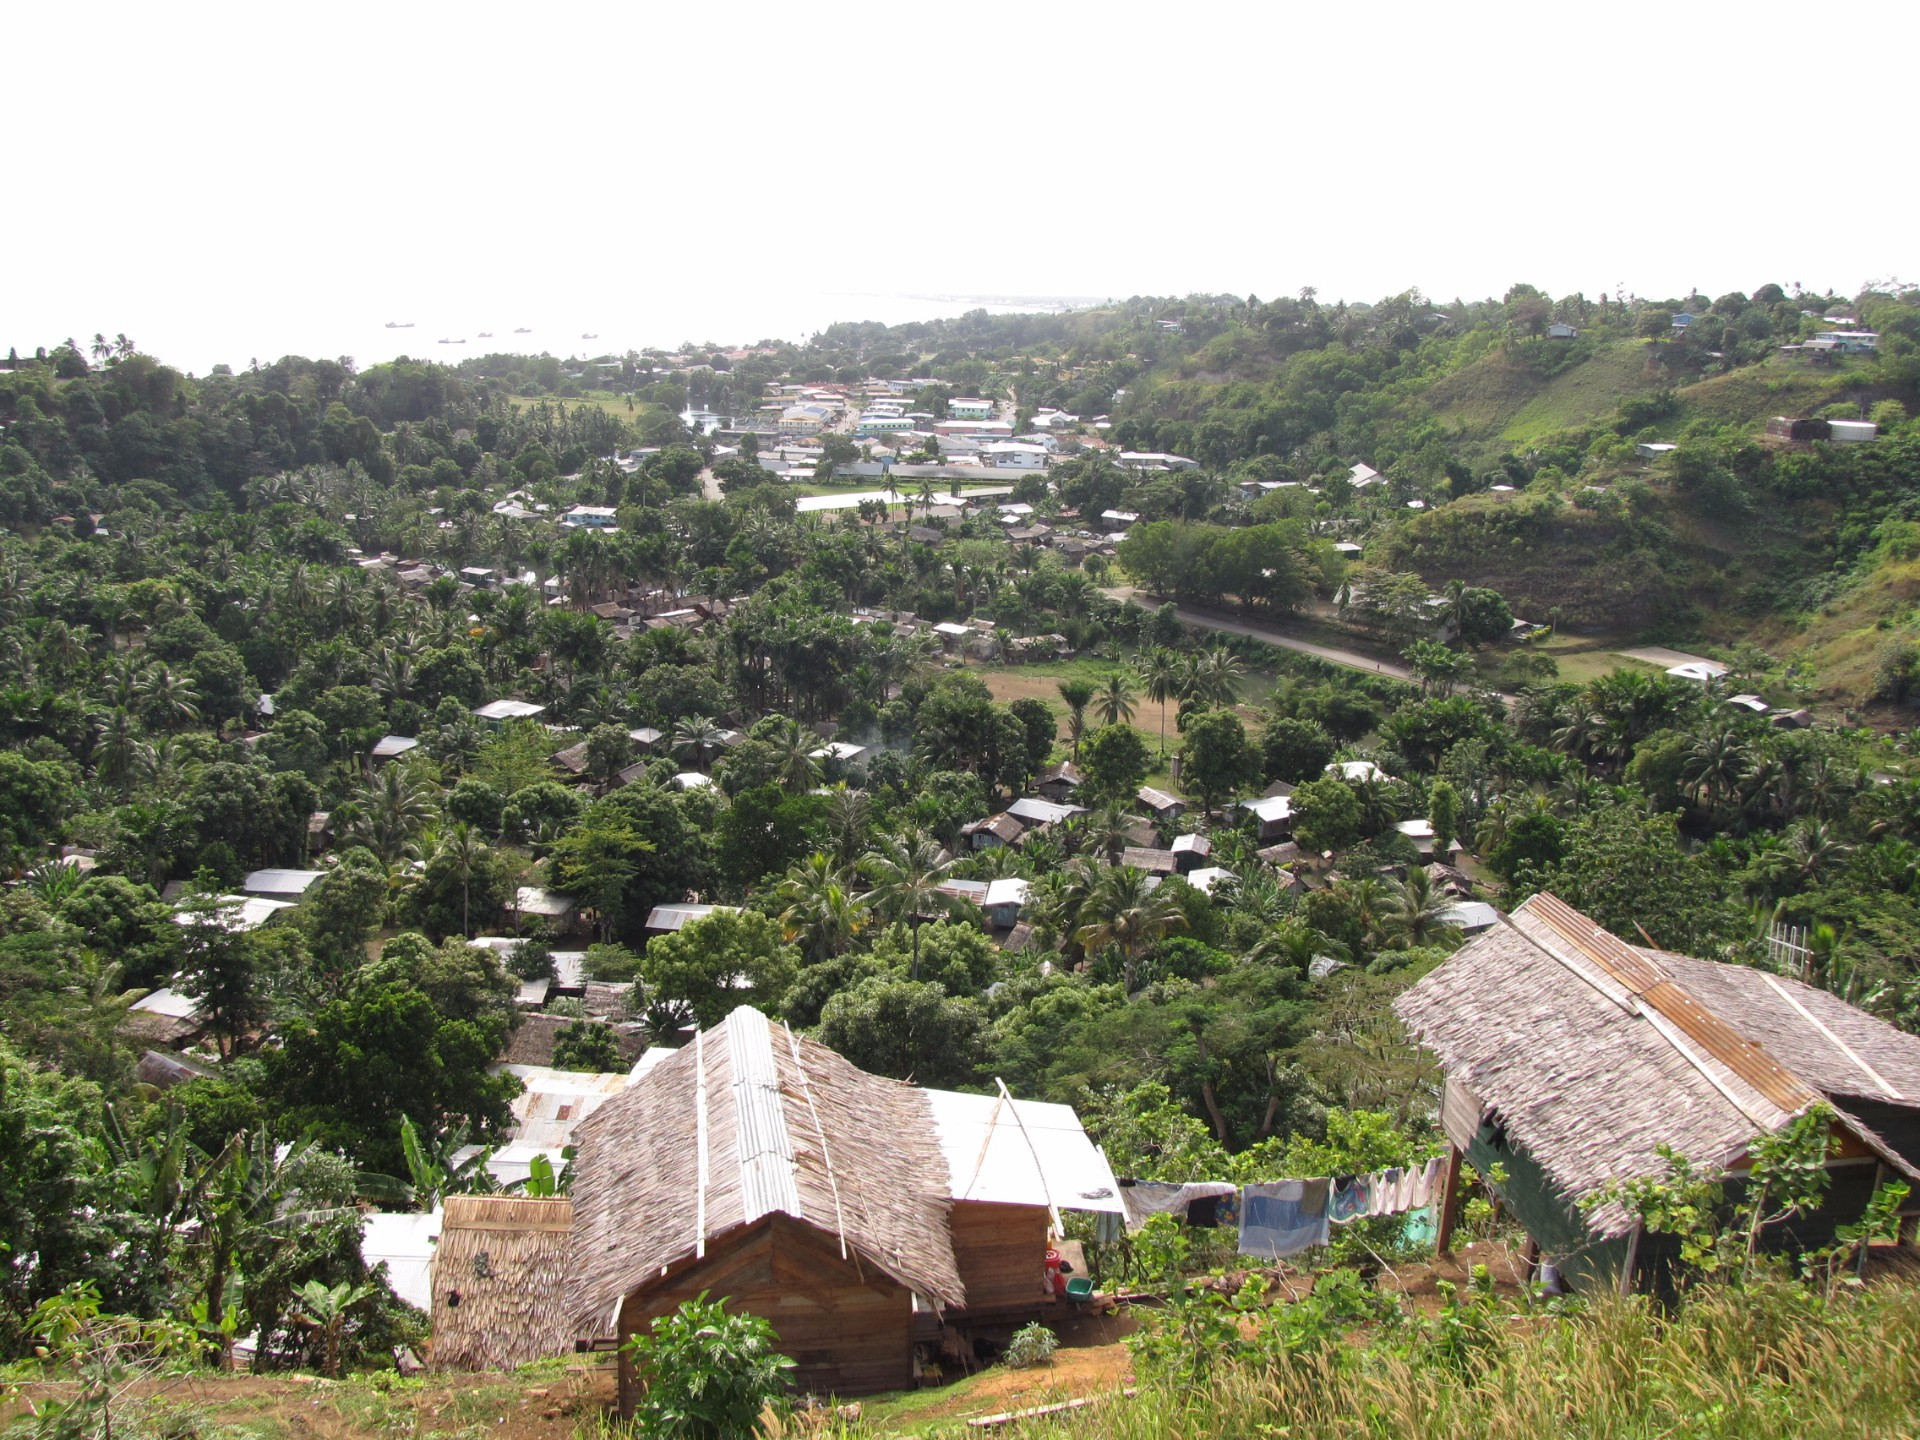 Solomon Islands Population in 2017